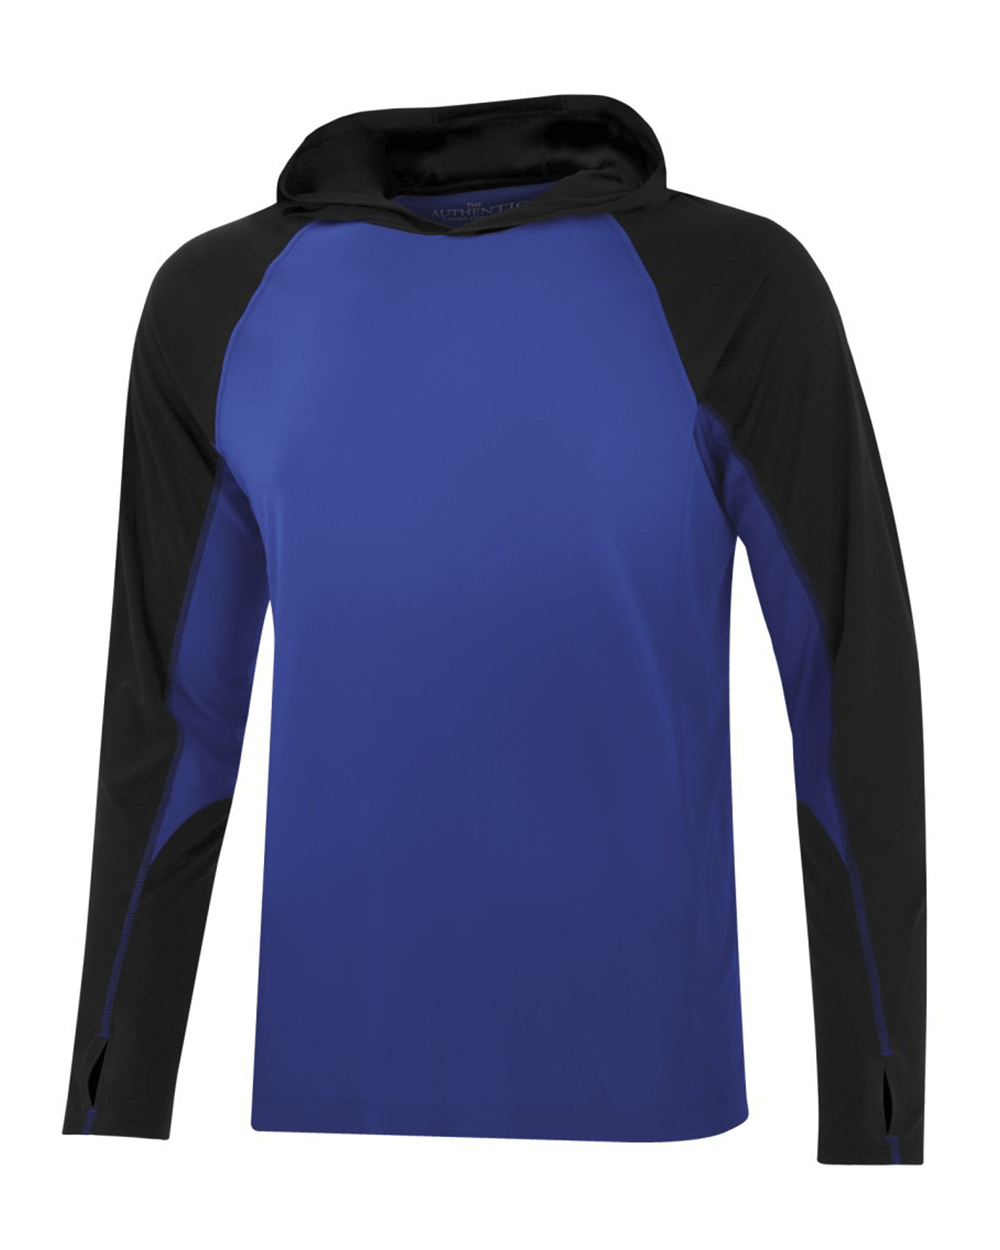 Pro Team Longsleeve Hooded T-Shirt